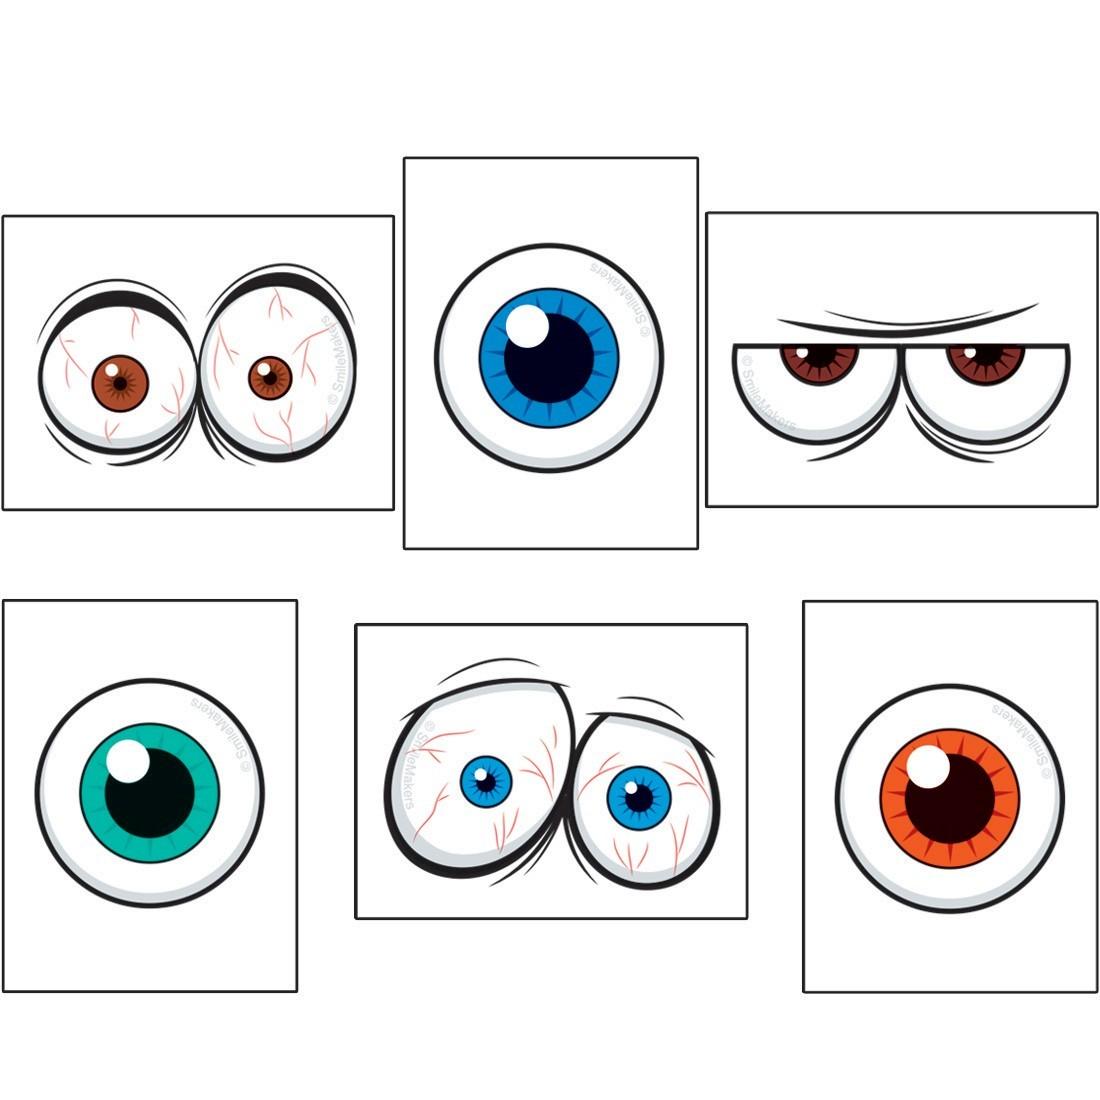 Eyeball Temporary Tattoos   [image]